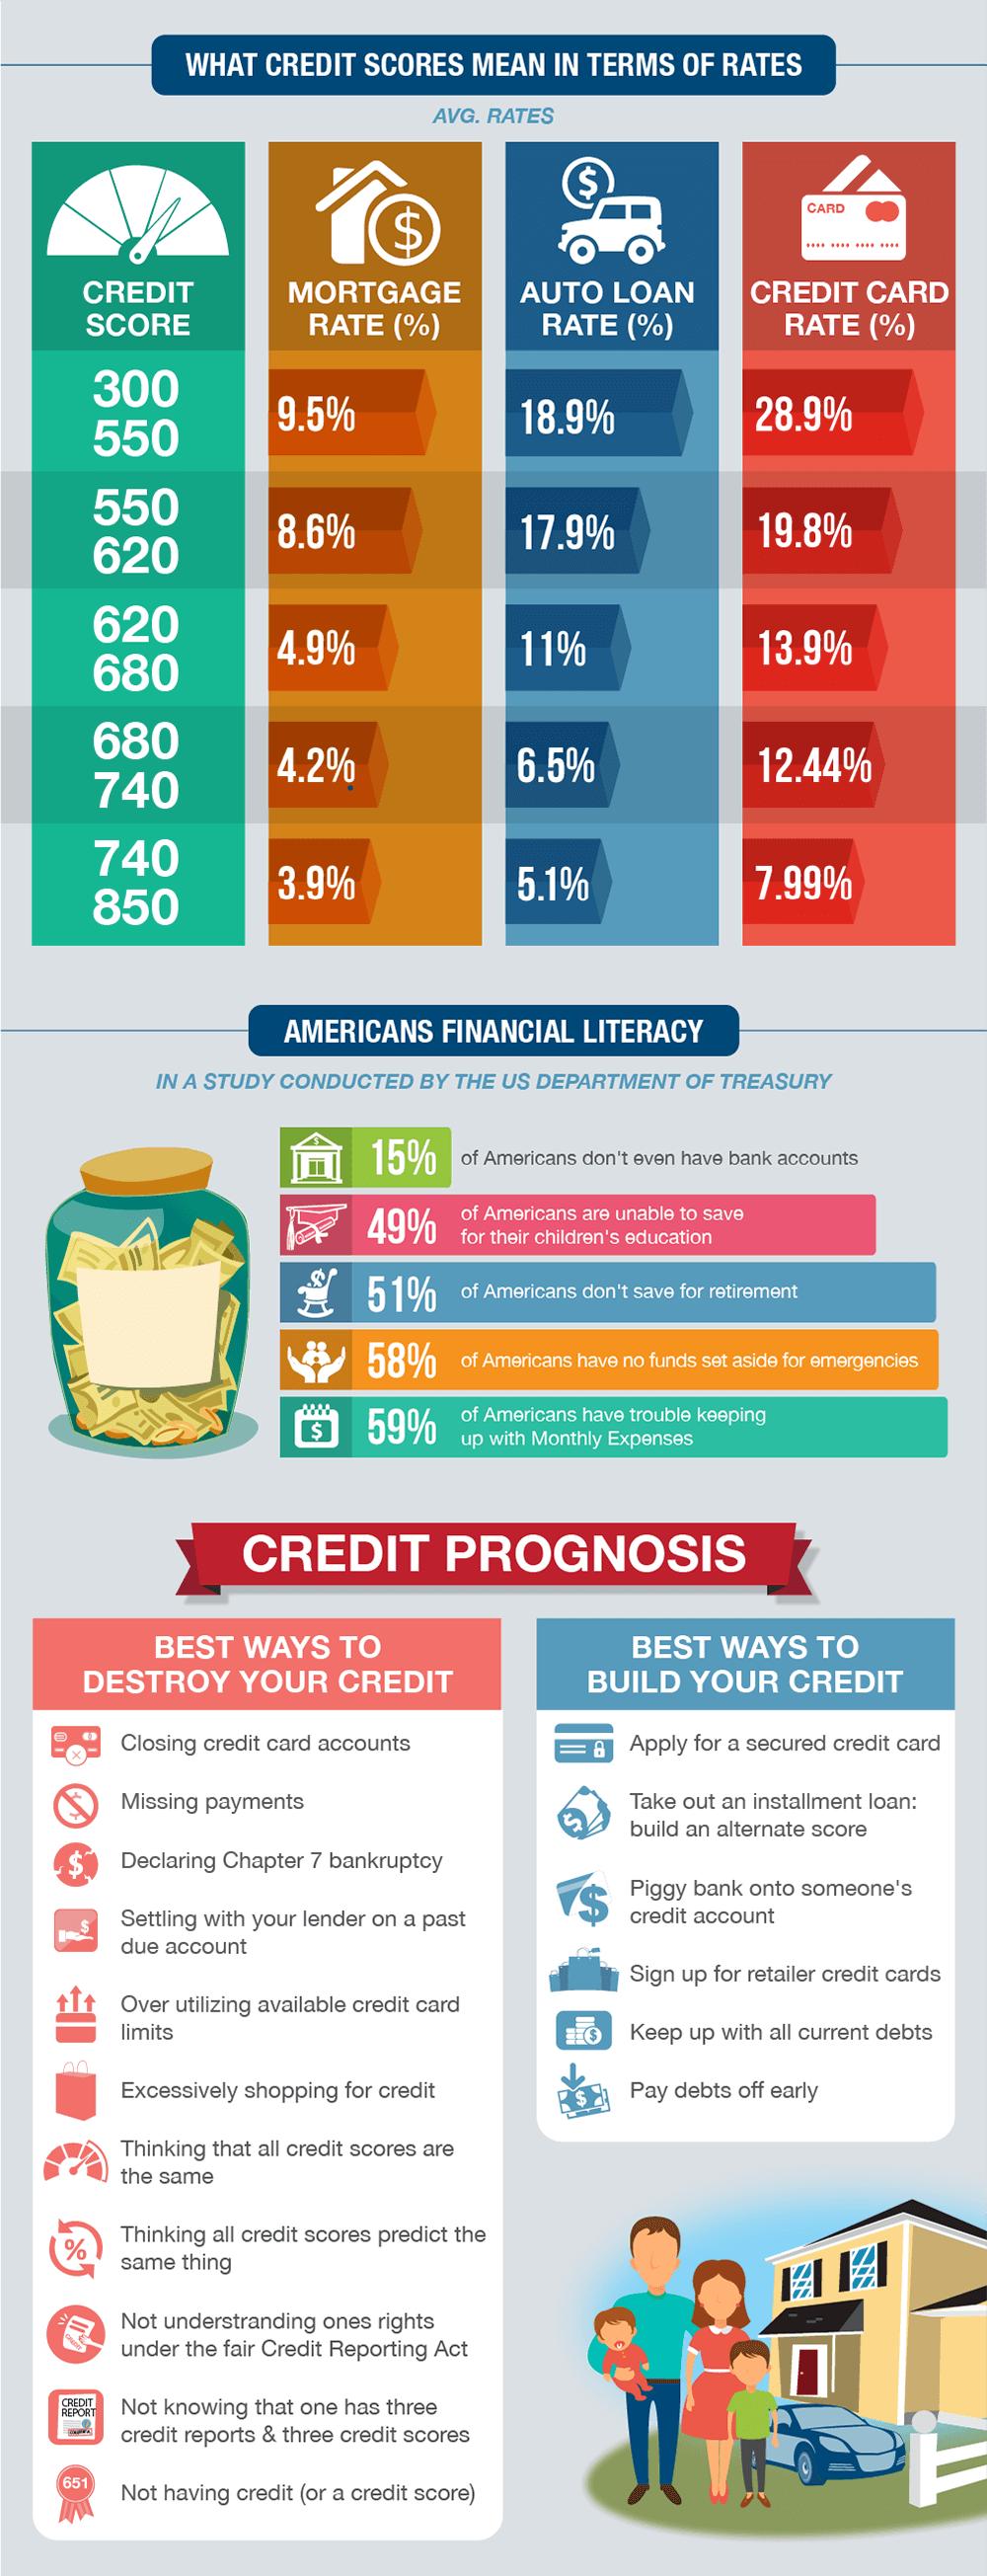 how-credit-scores-affect-interest-rates